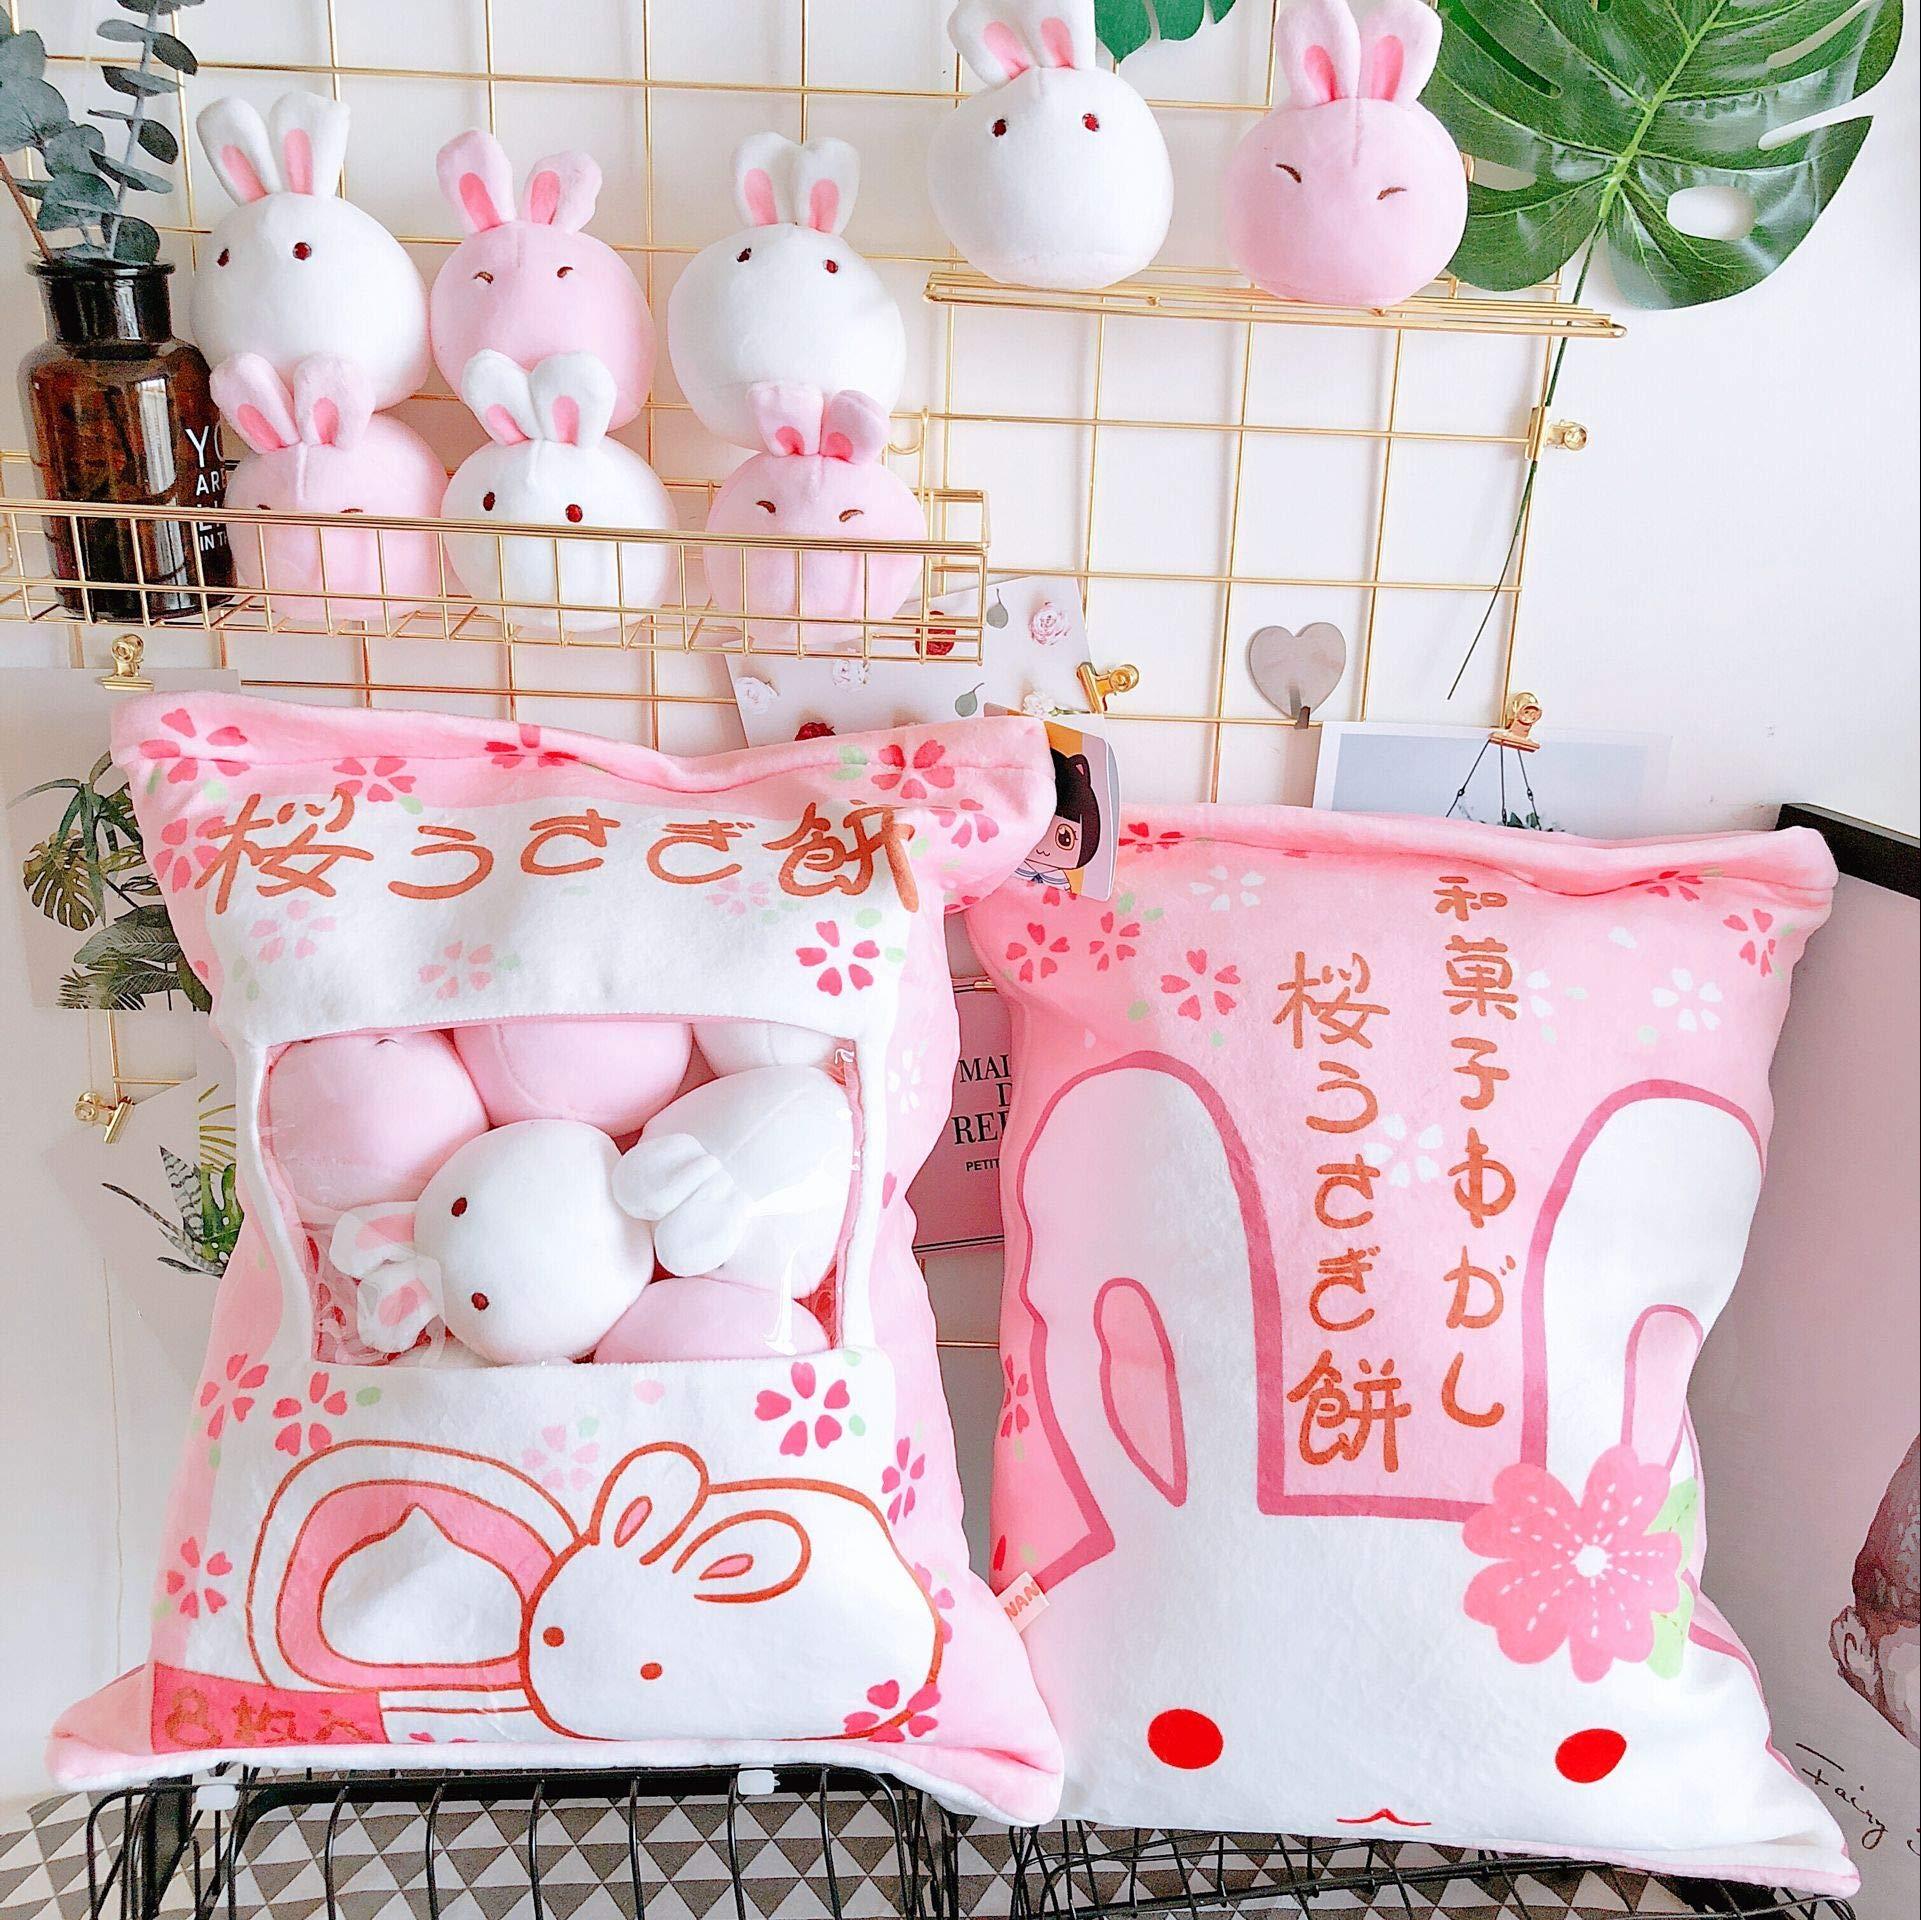 Nenalayo Cute Throw Pillow Stuffed Animal Toys Removable Fluffy Bunnies Creative Gifts for Teens Girls Kids by Nenalayo (Image #5)